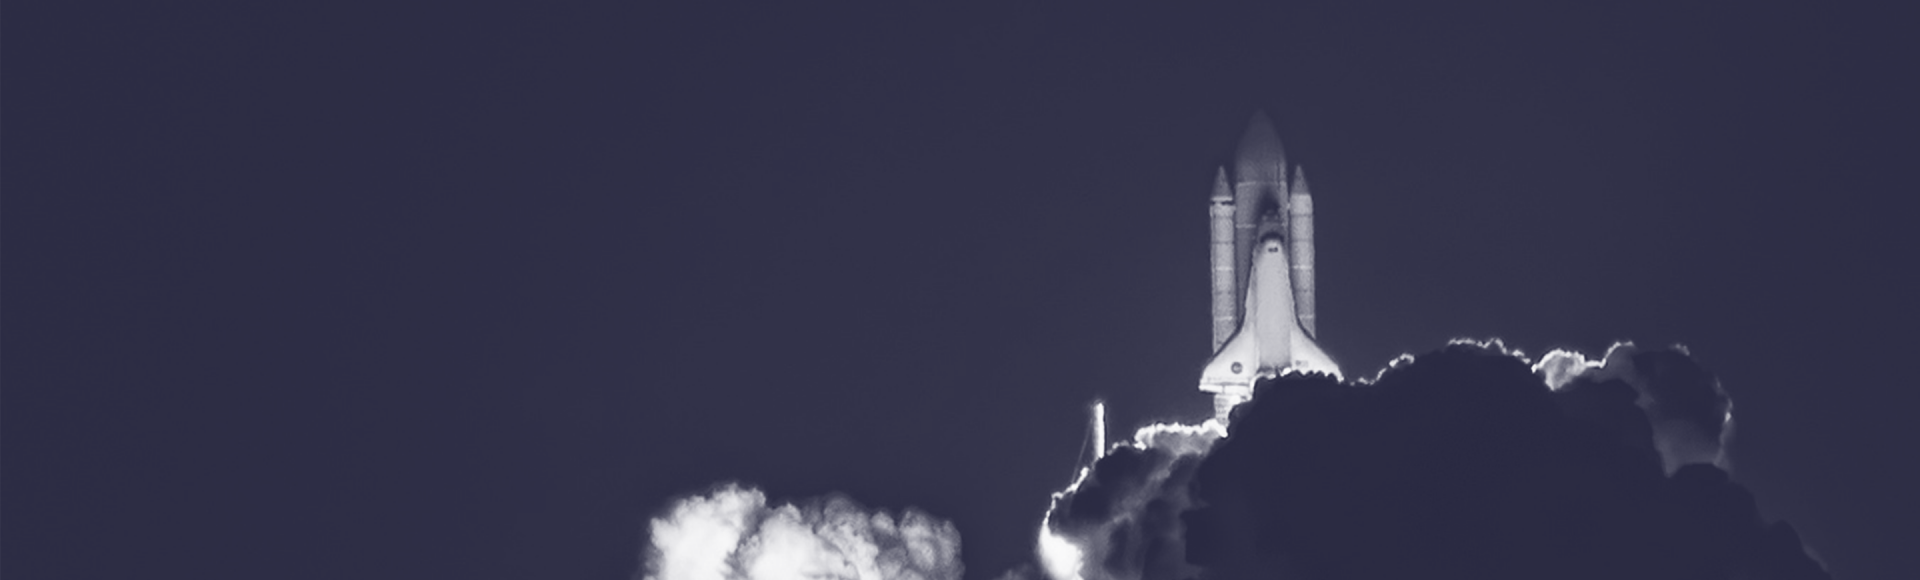 ARK-Invest_Blog-Banner_2018_08_03---Space